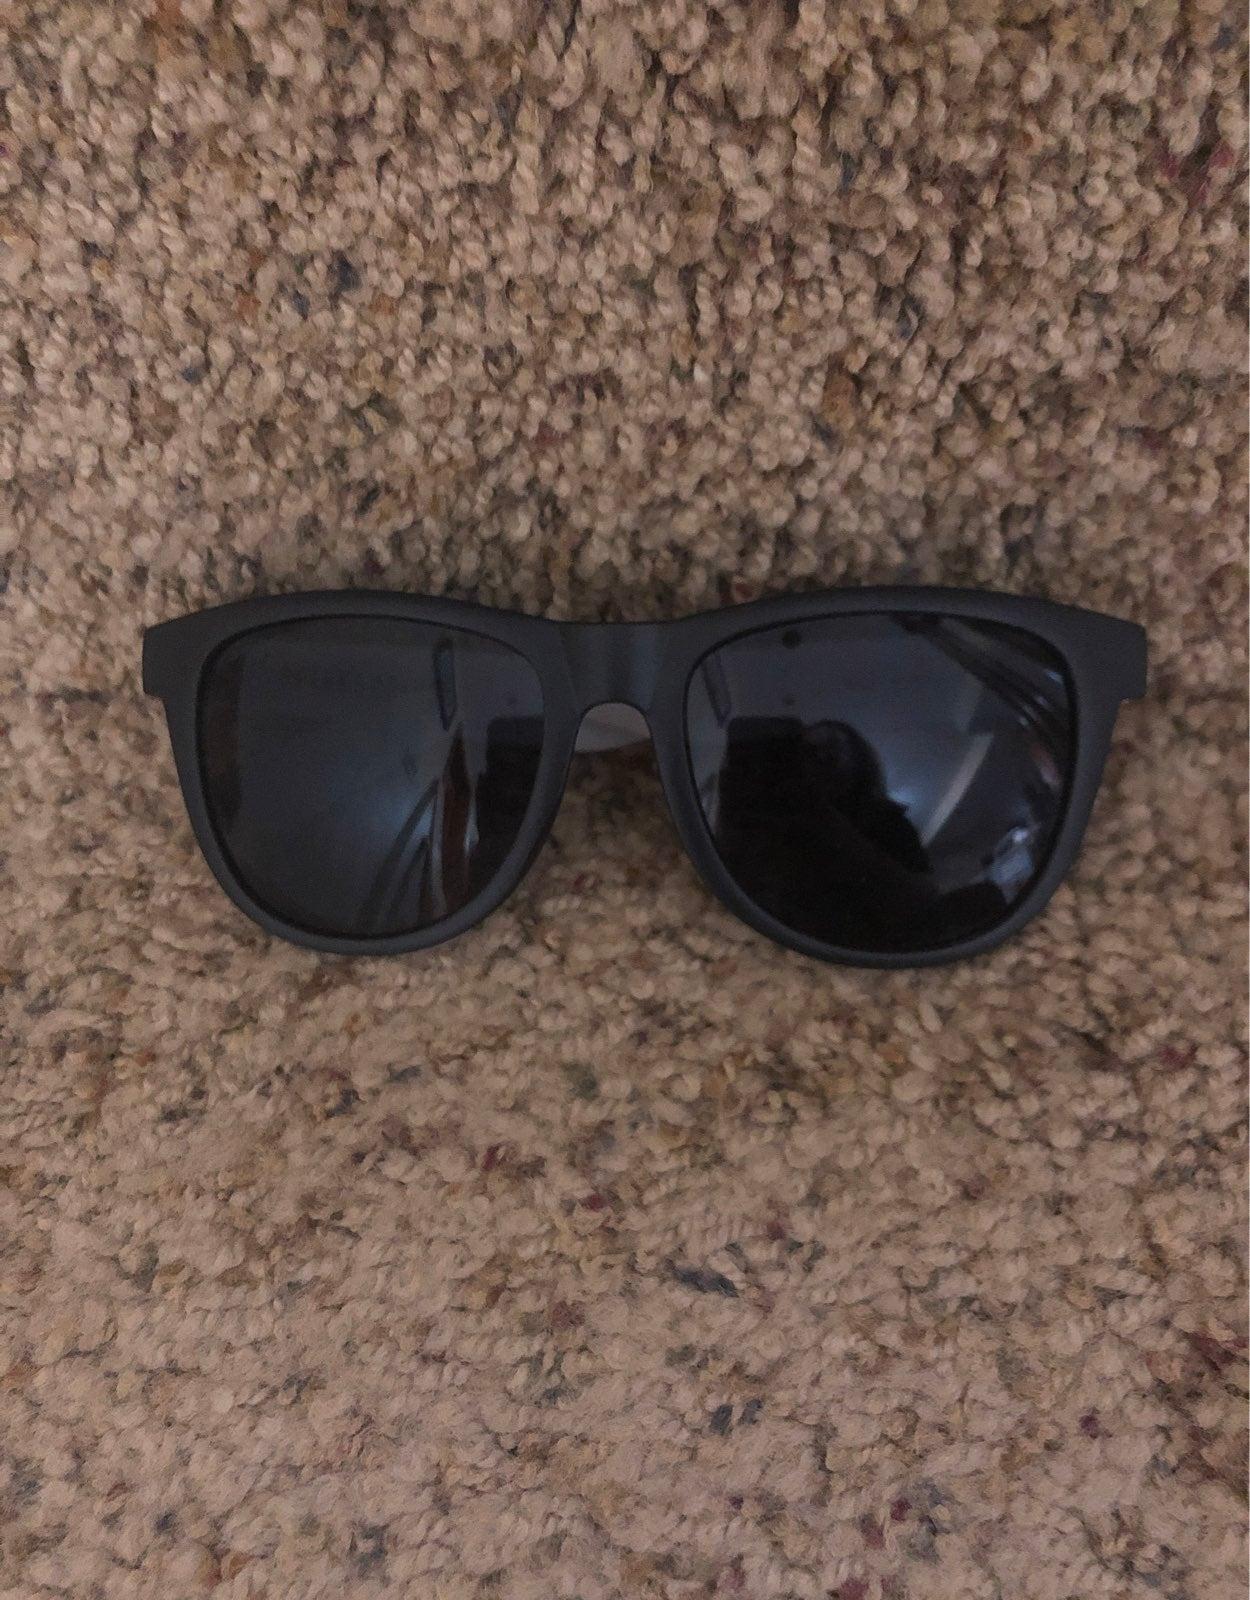 Victoras Secret Pink Sunglasses